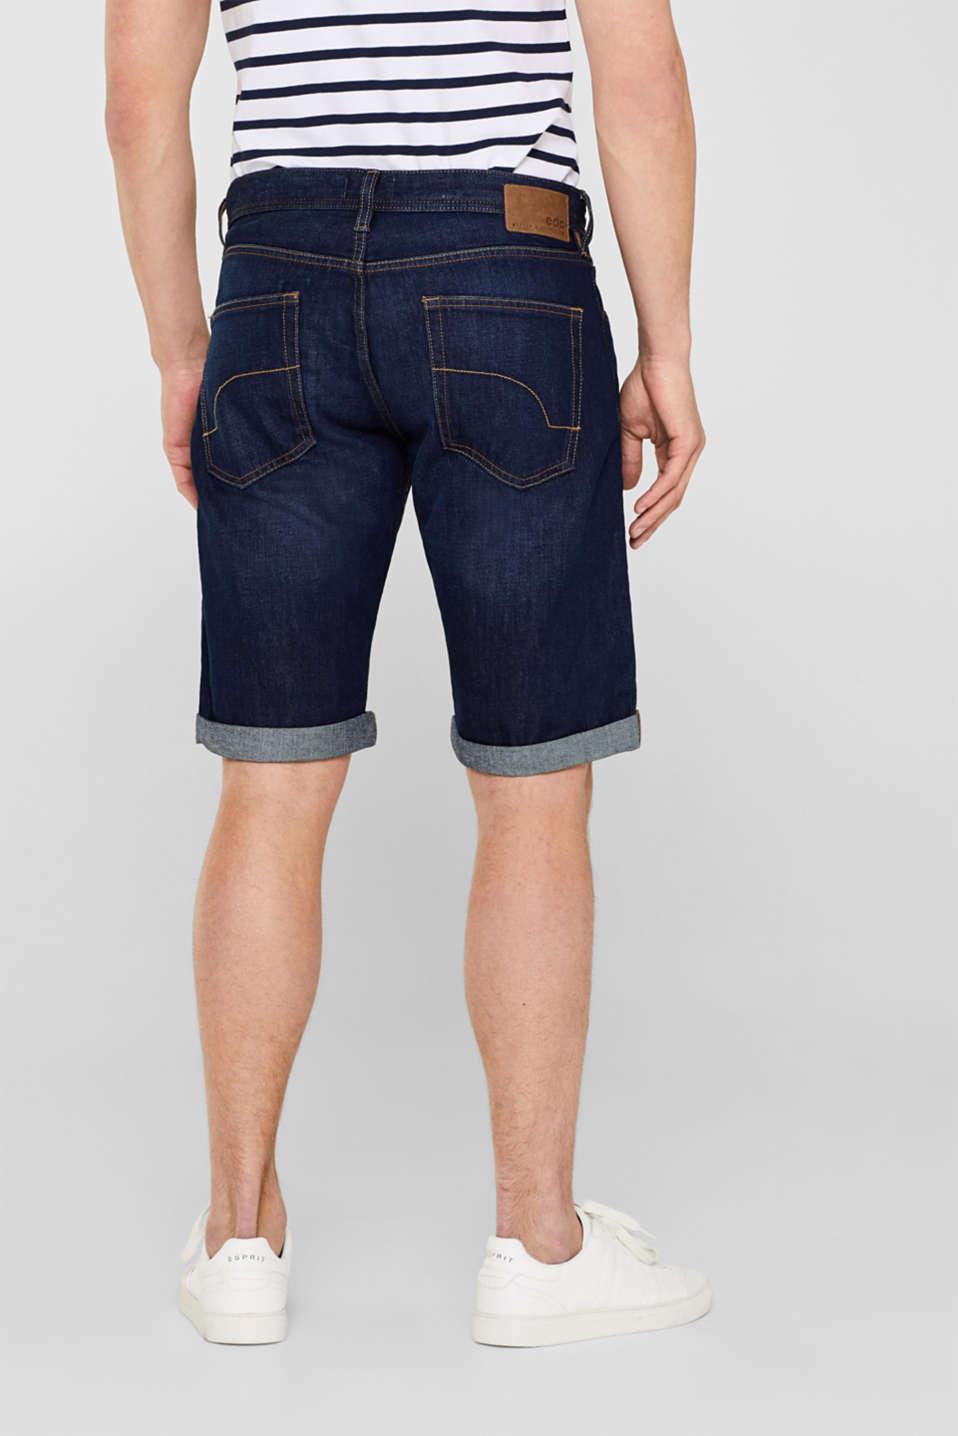 Shorts denim, BLUE DARK WASH, detail image number 3